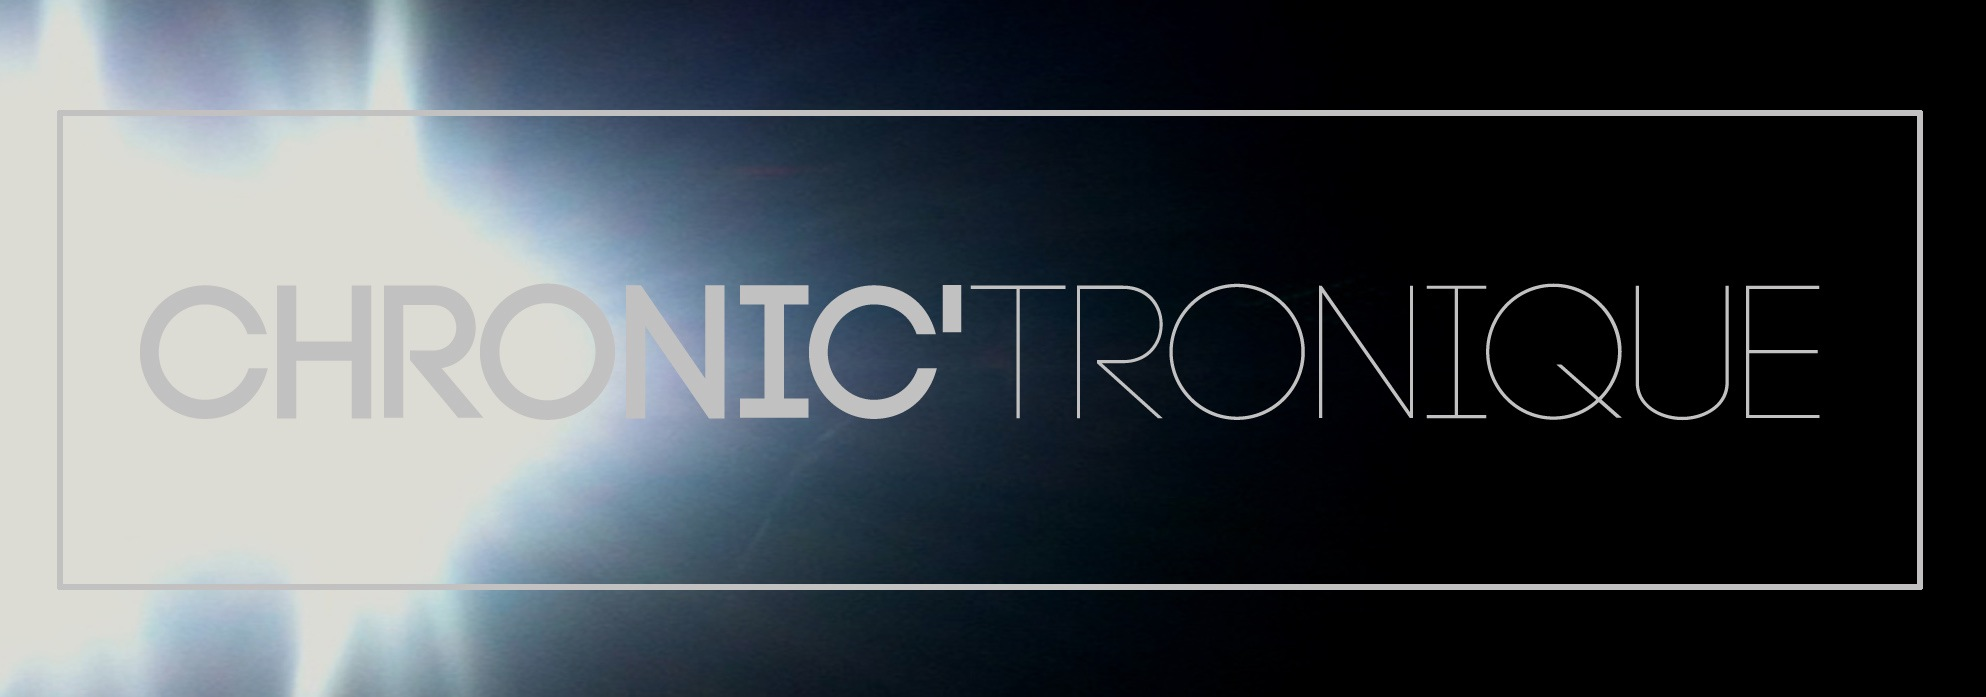 chronique_tronique_5